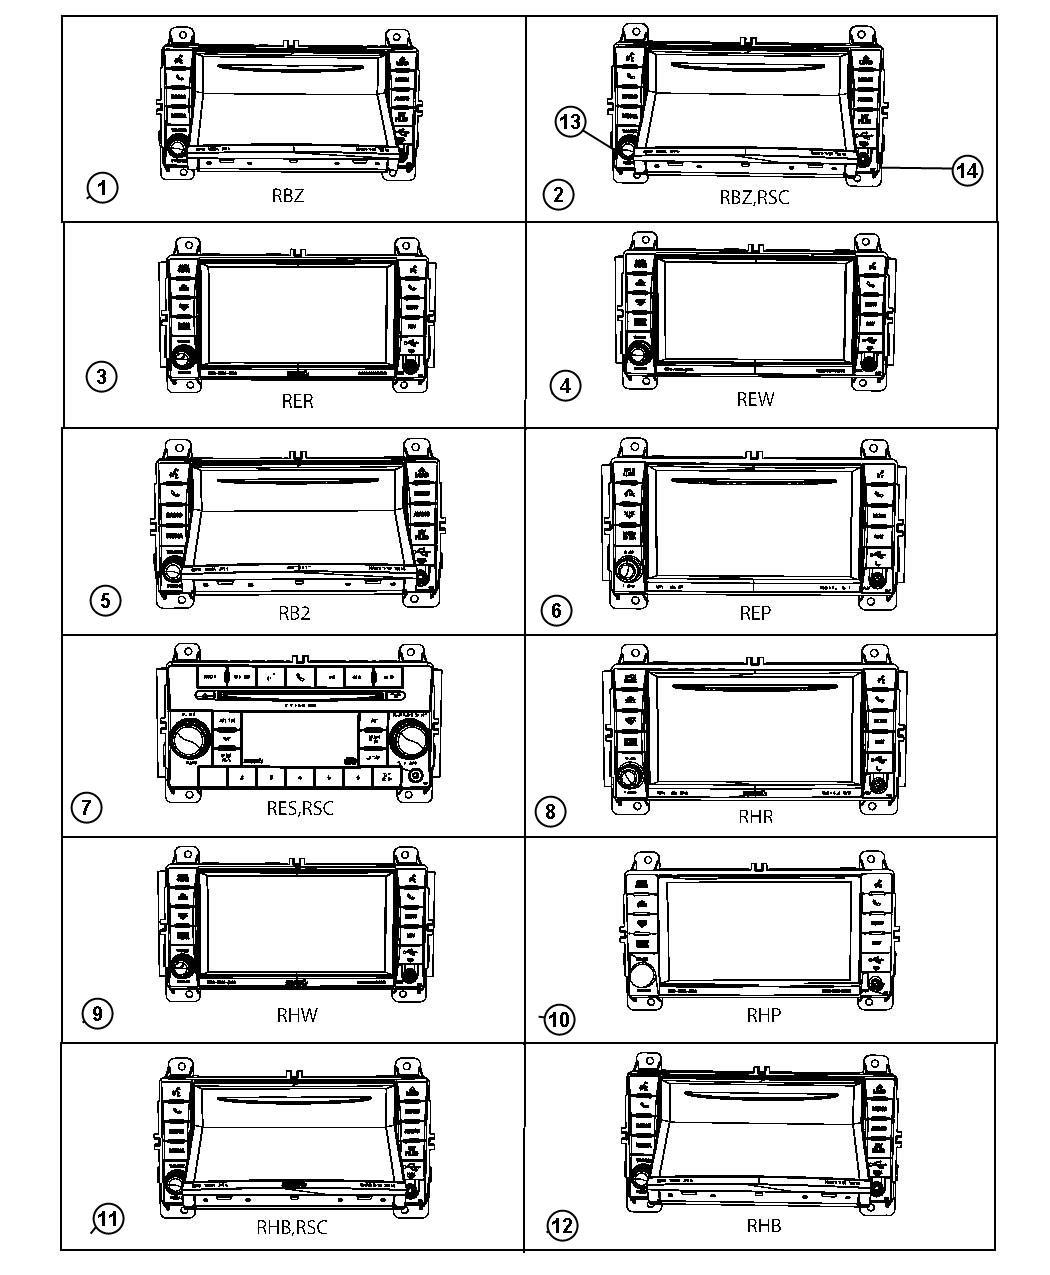 Dimmer Switch Wiring Diagram Likewise 2005 Gmc Envoy Radio Further